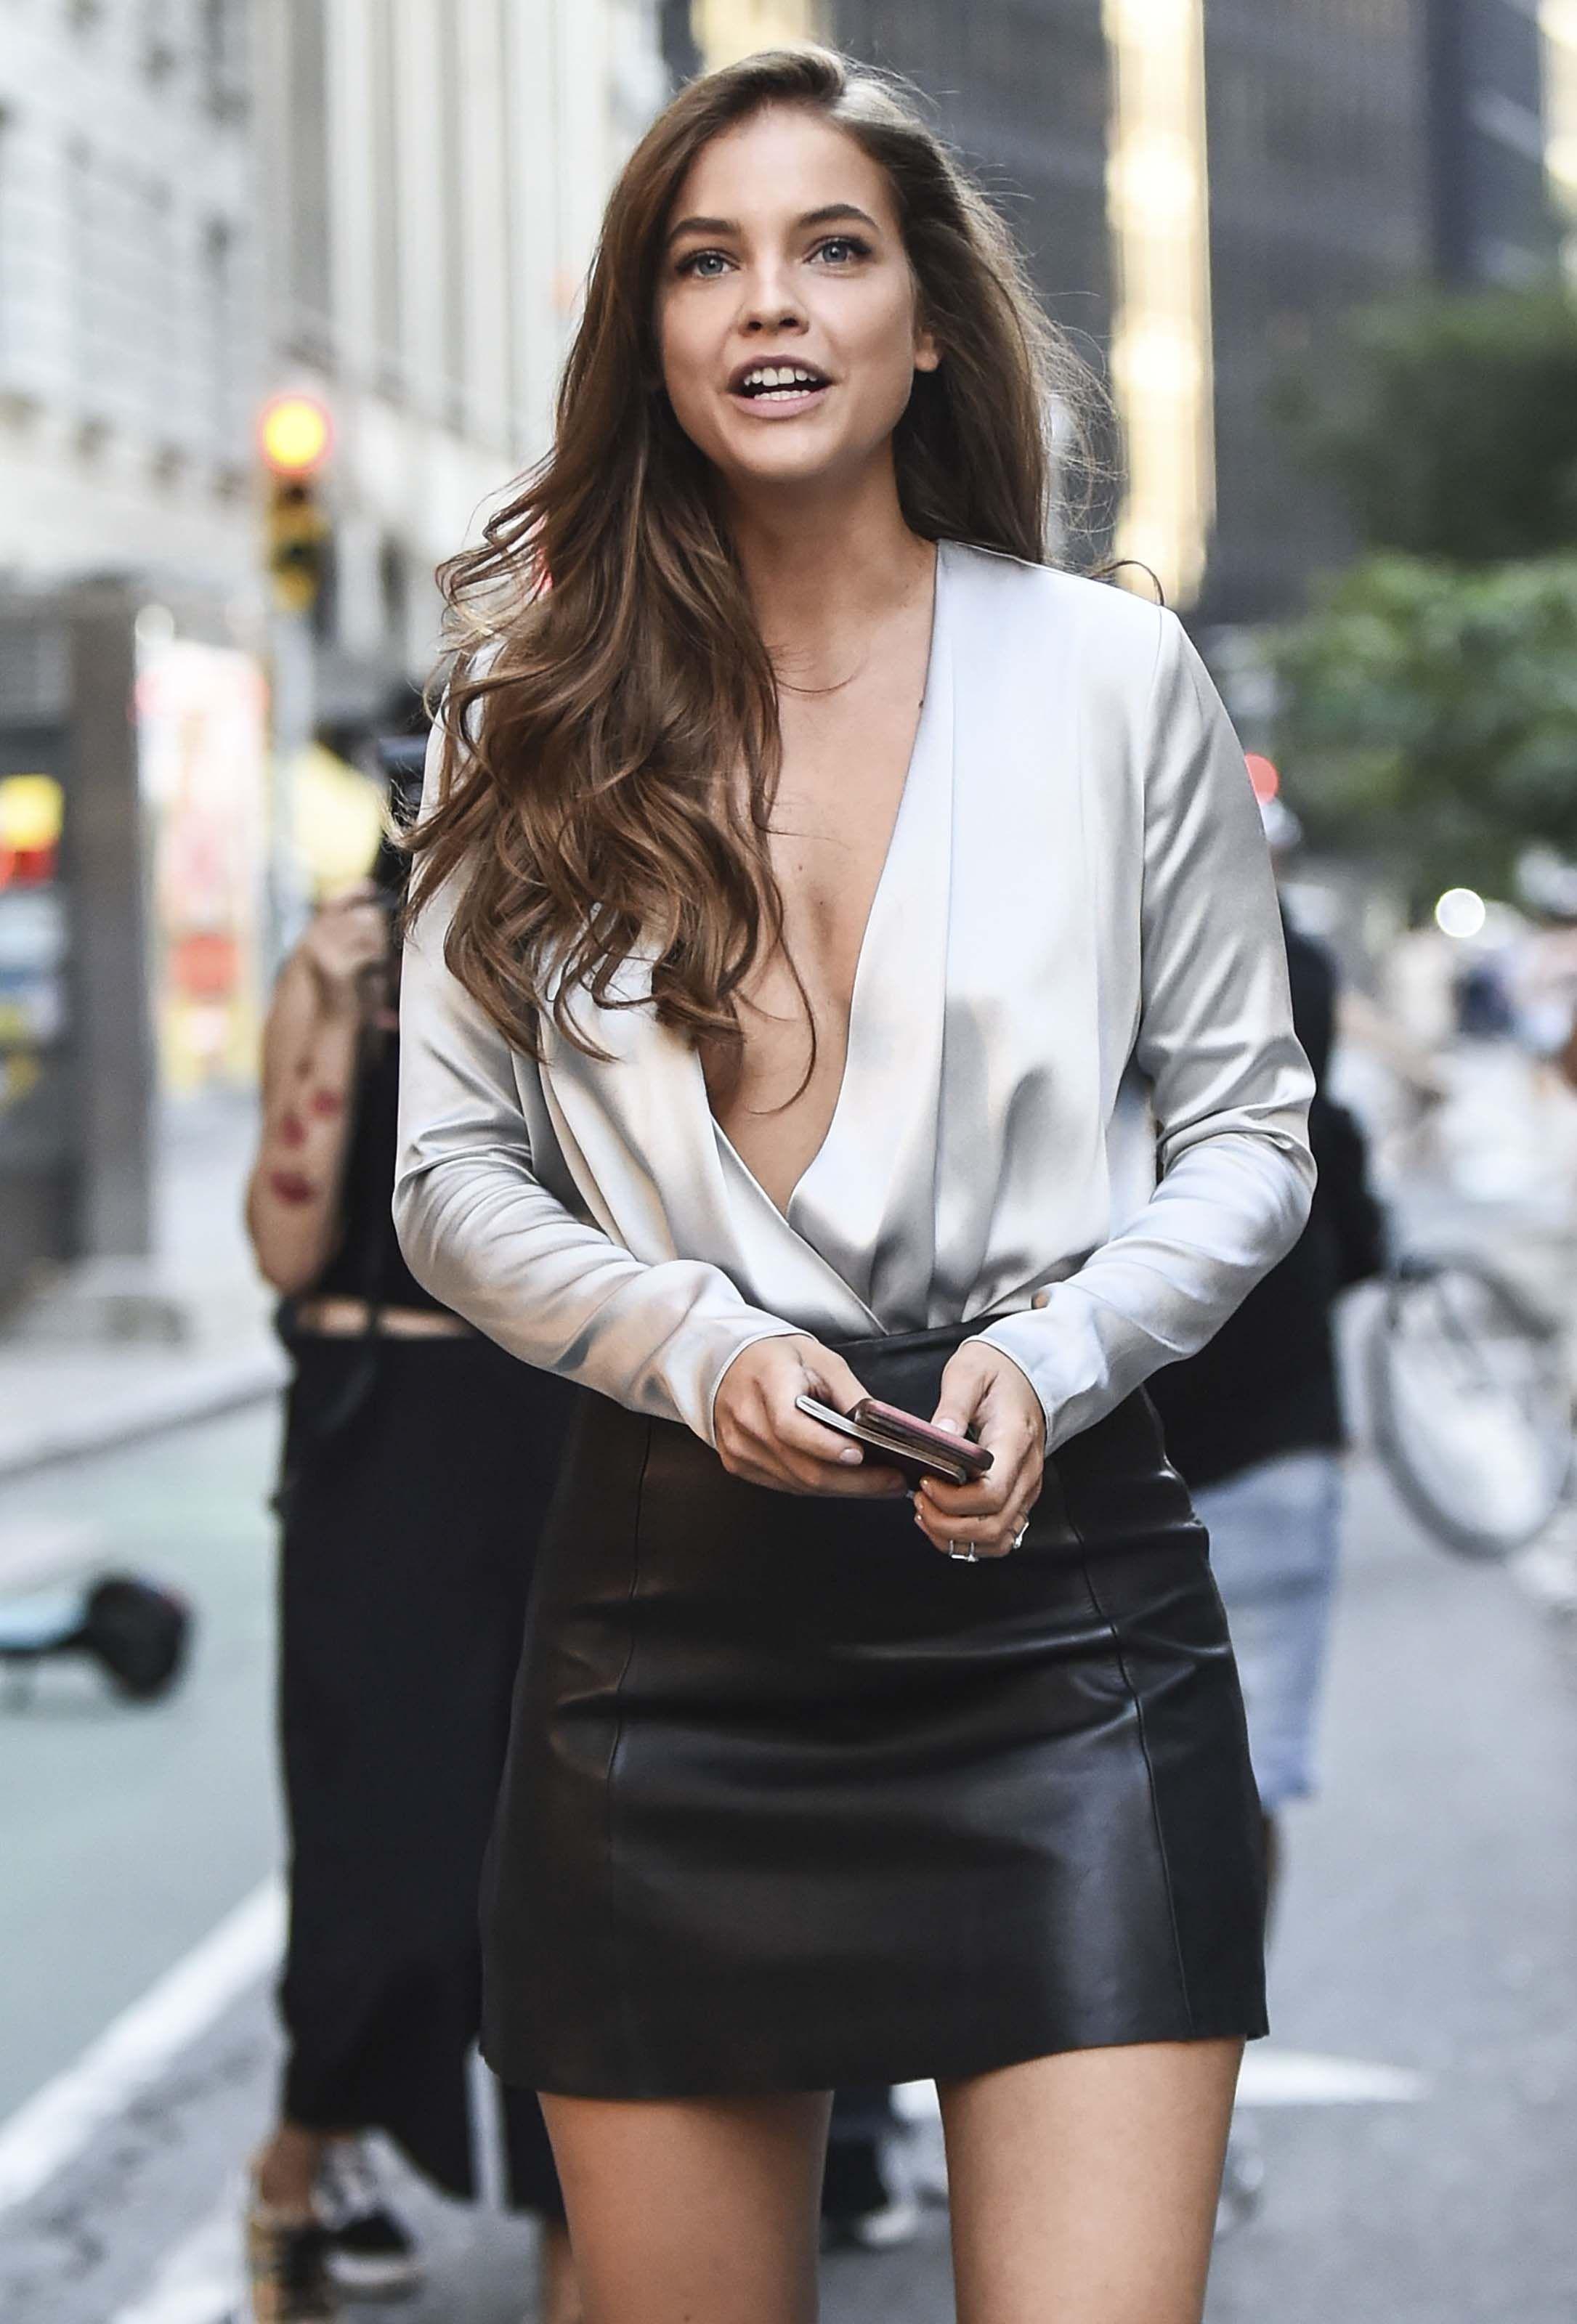 Celebrites Marissa Jade nudes (13 photos), Ass, Cleavage, Instagram, bra 2019